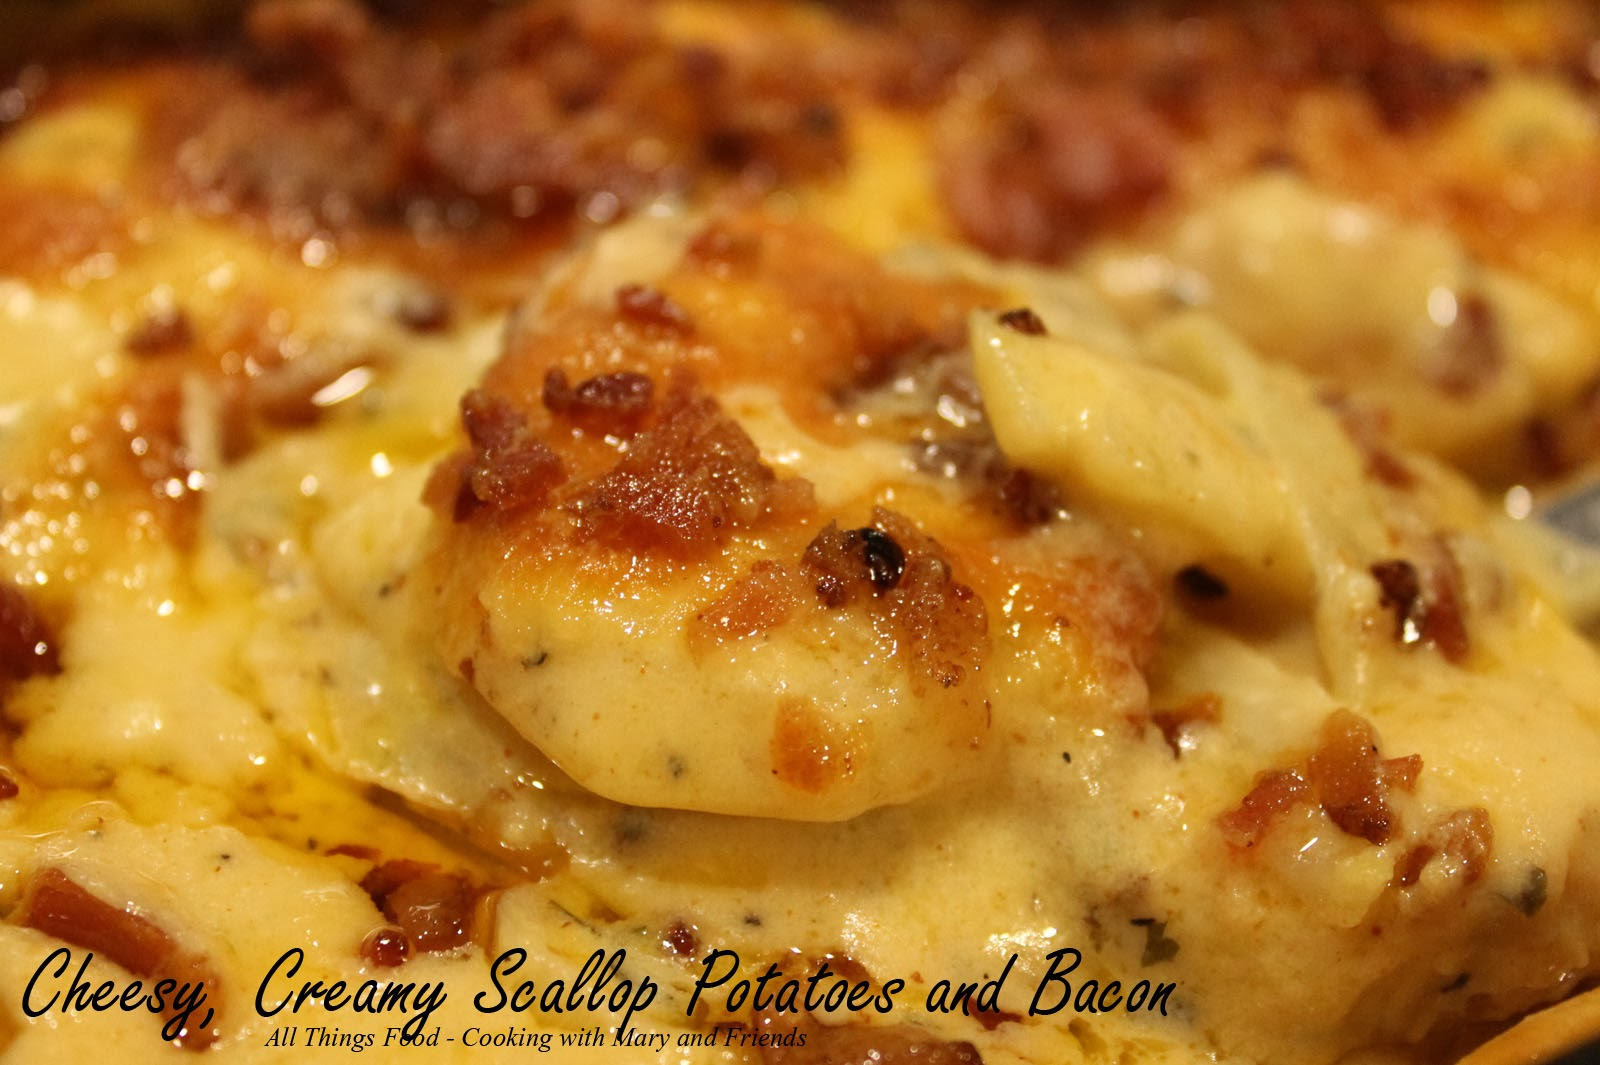 Cheesy, Creamy Scallop Potatoes with Bacon